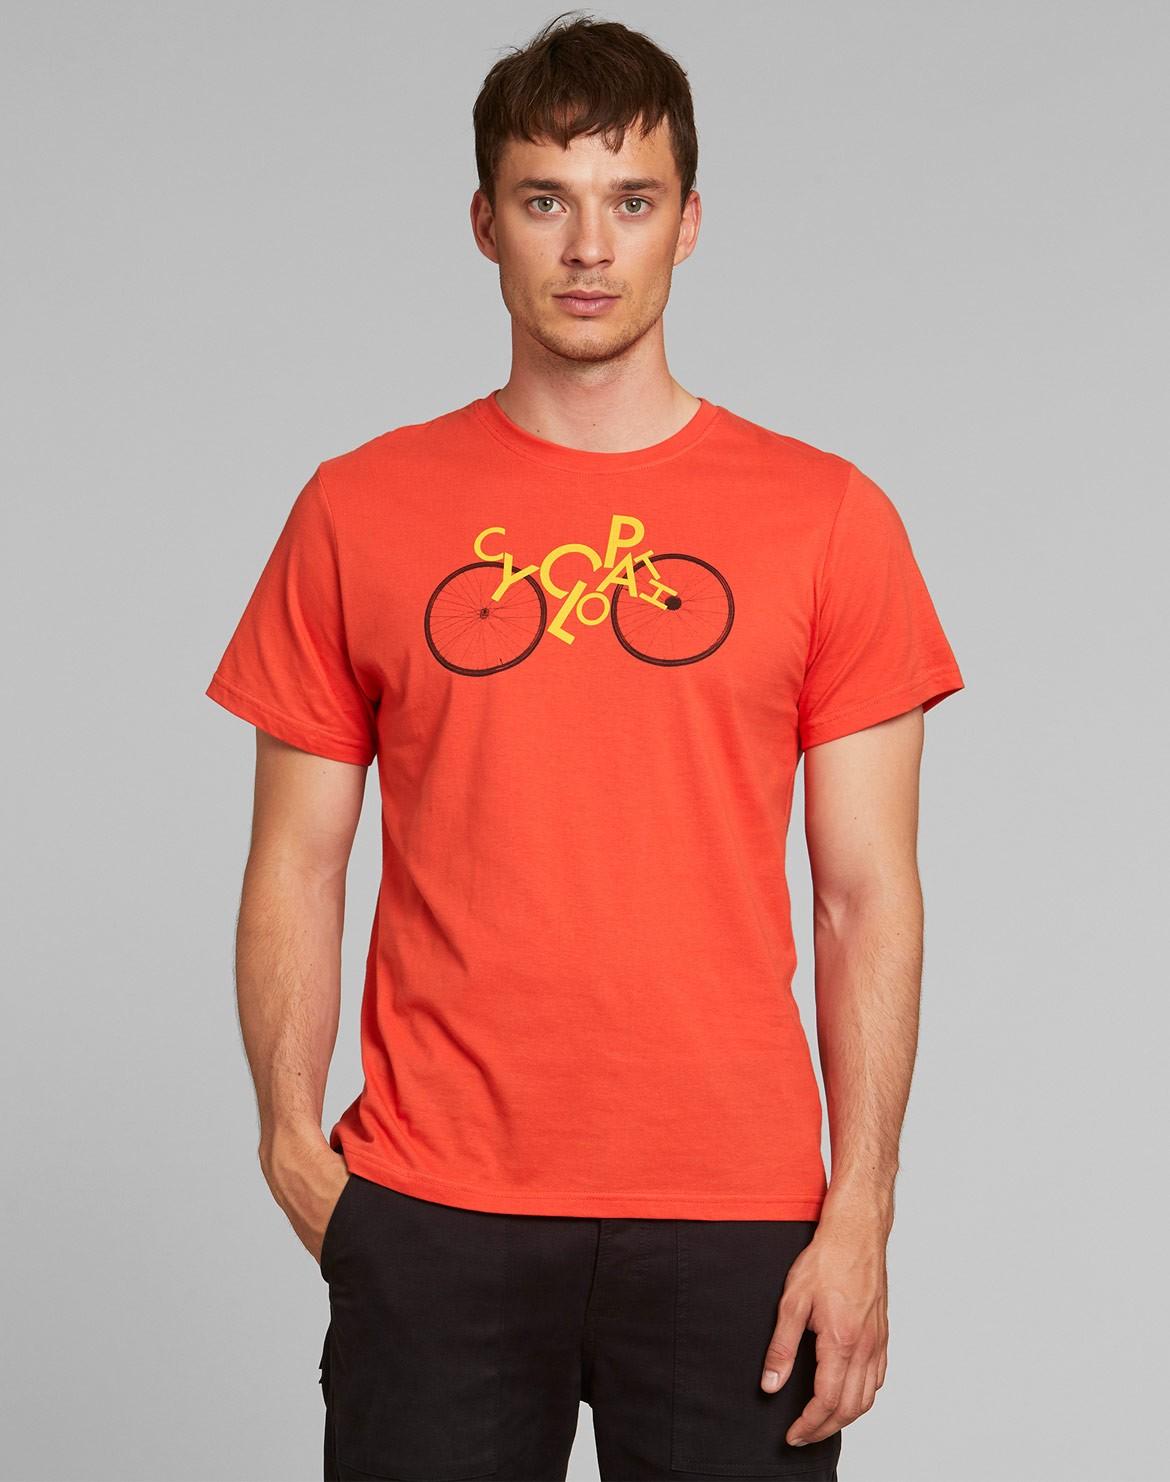 Stockholm Cyclopath T-Shirt